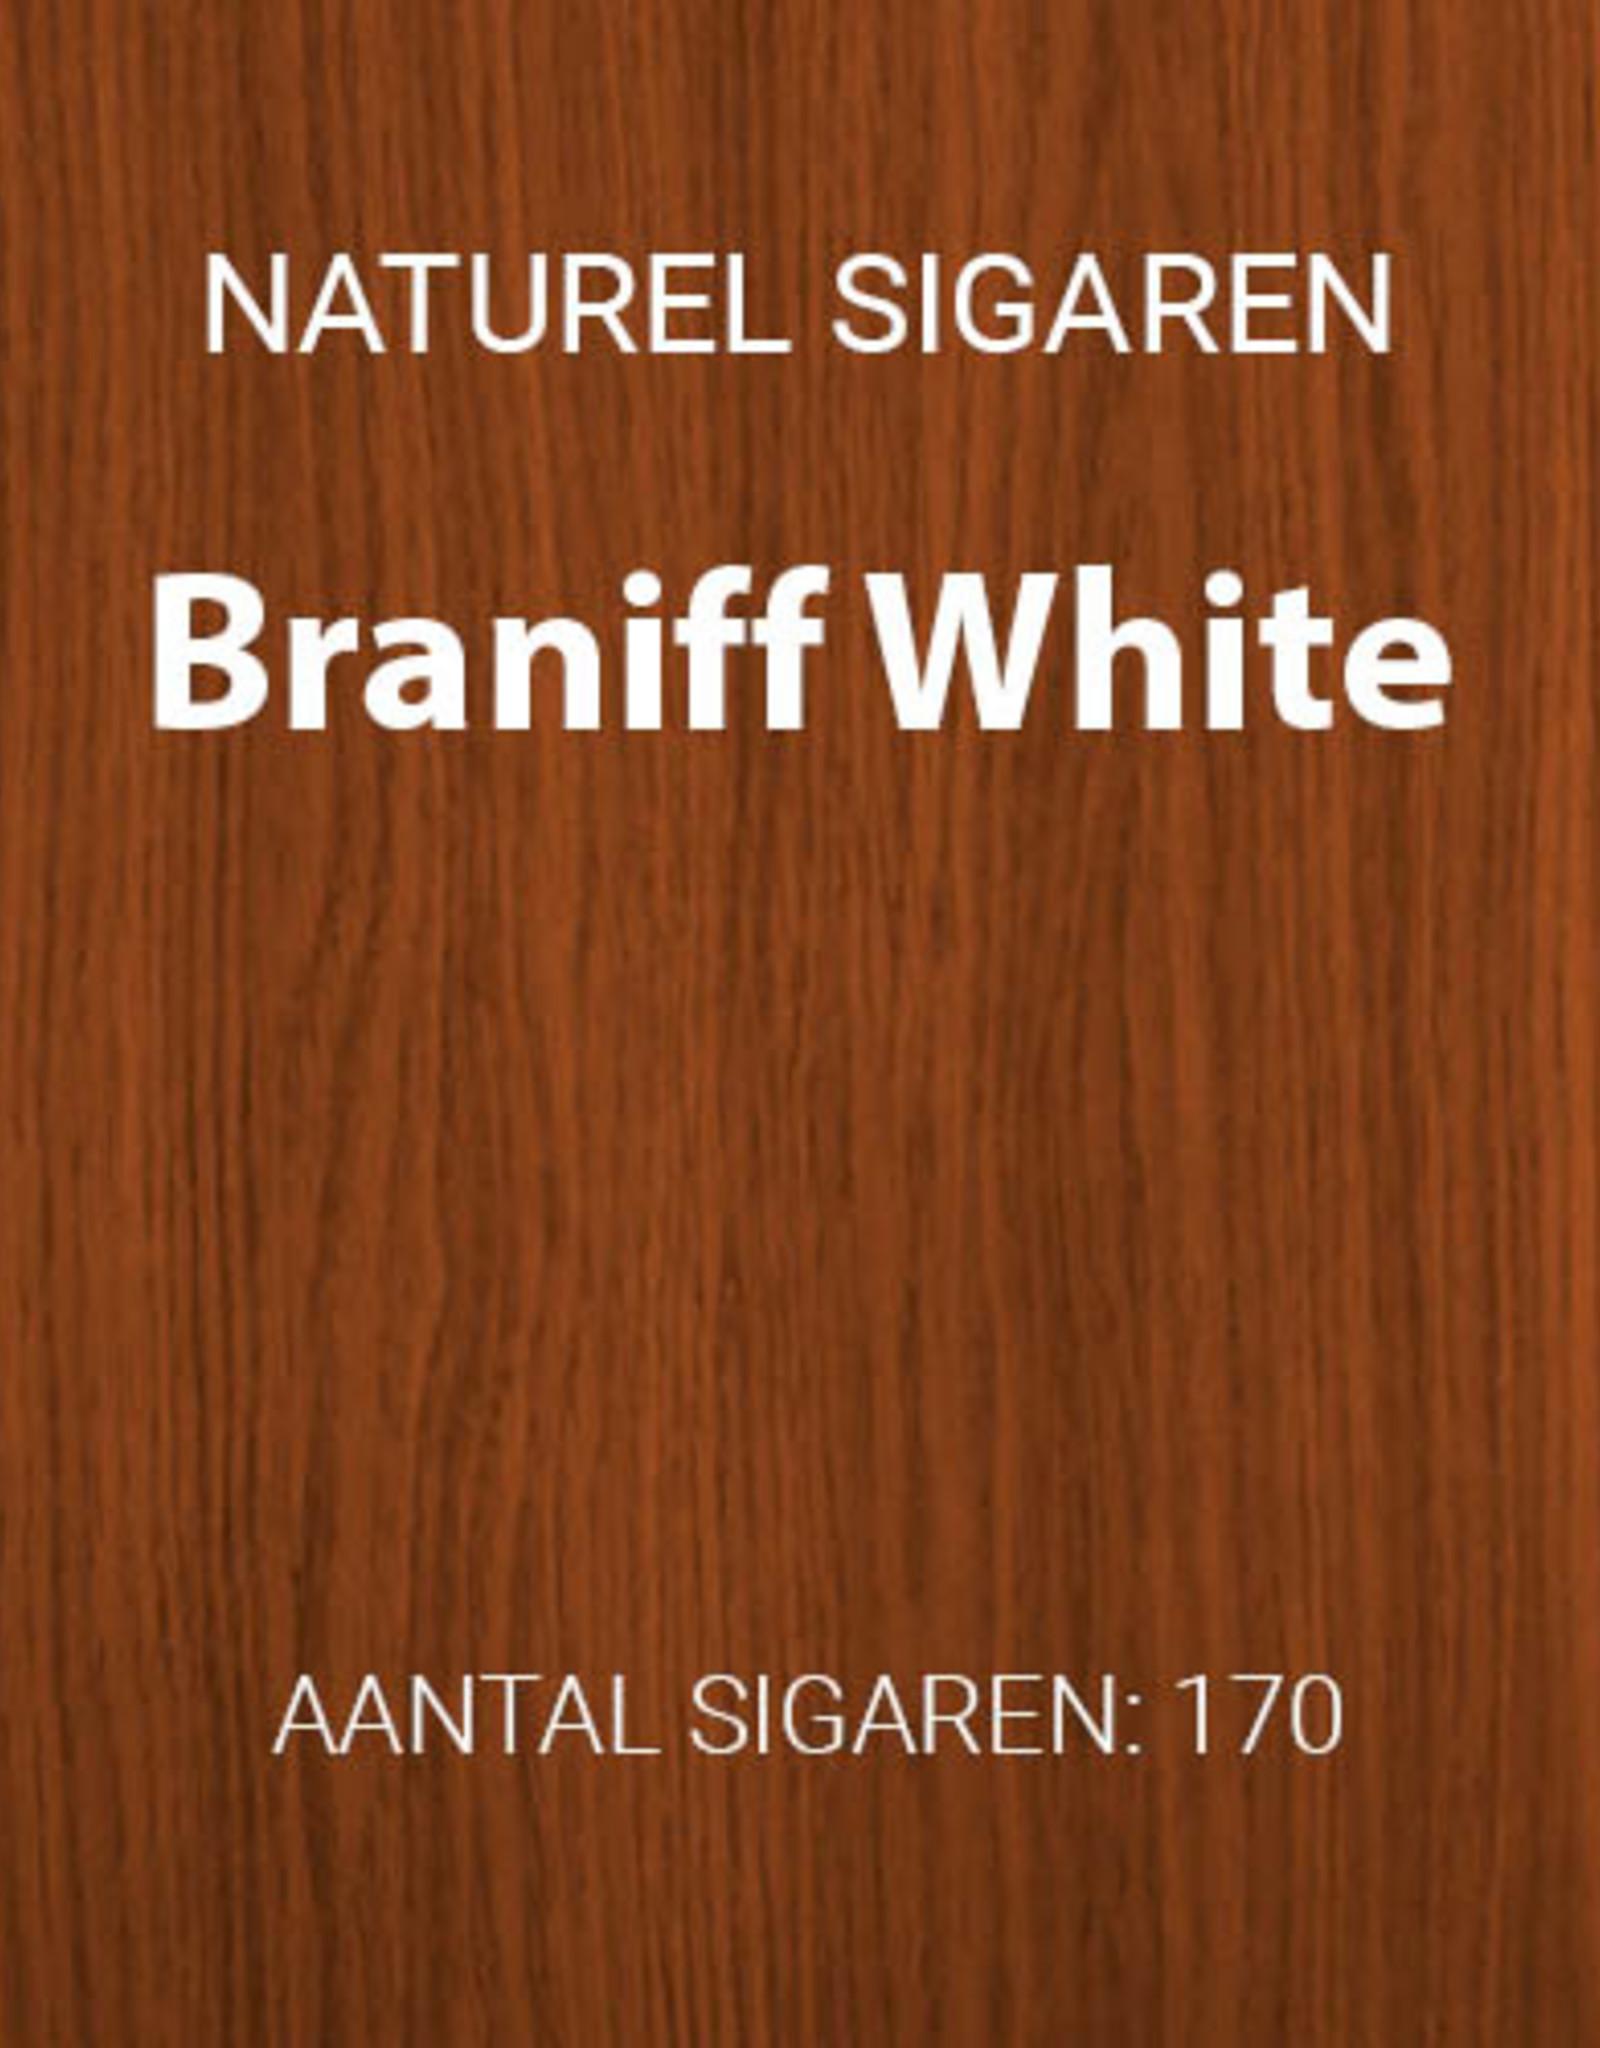 Braniff White filter cigarillos